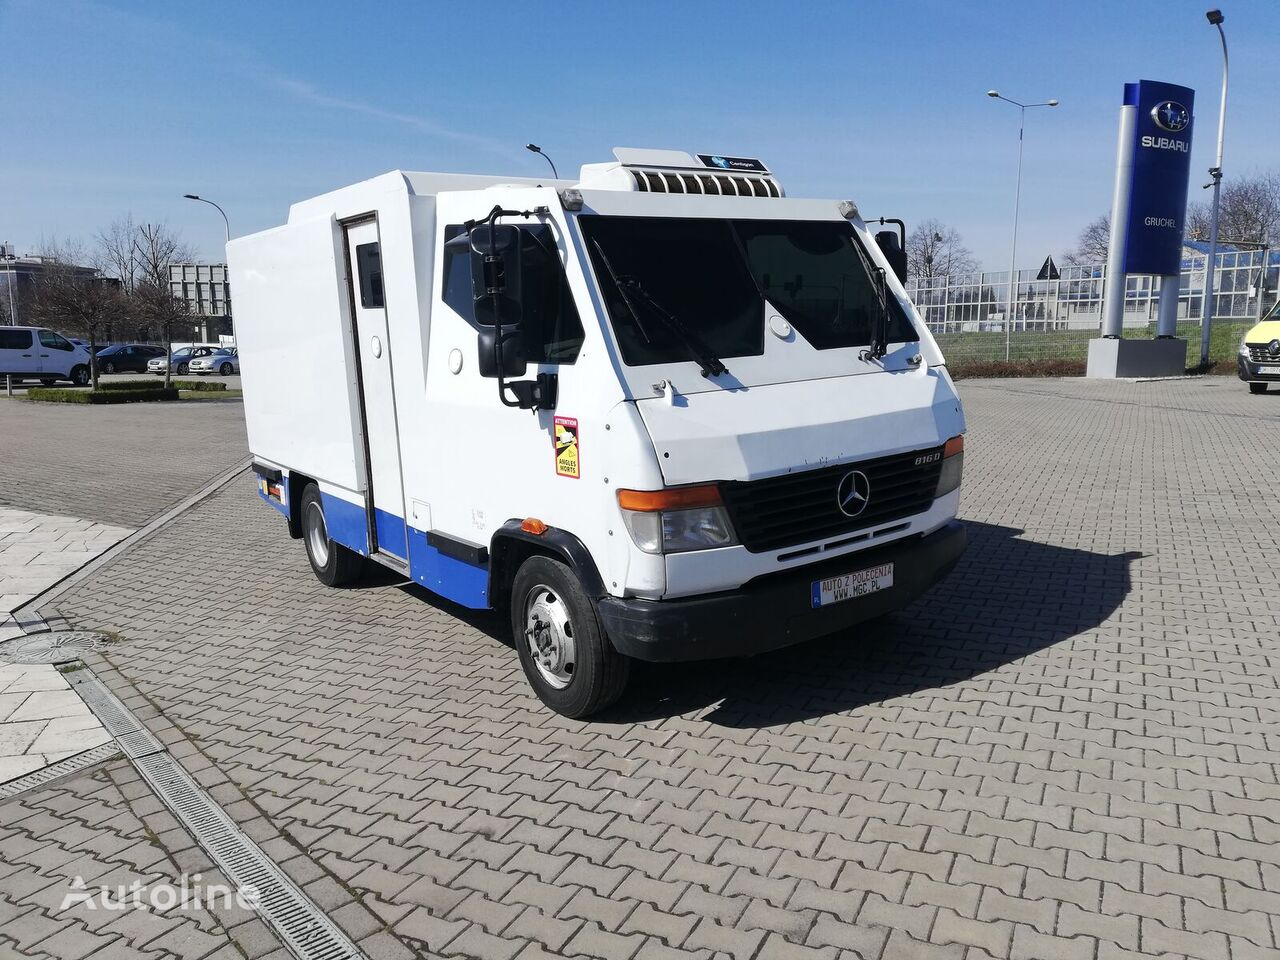 MERCEDES-BENZ 816D,Bankowóz,Prawdziwy Pancernik,E5,Klasa BS4+,Jedyne Prawdziwe cash in transit truck